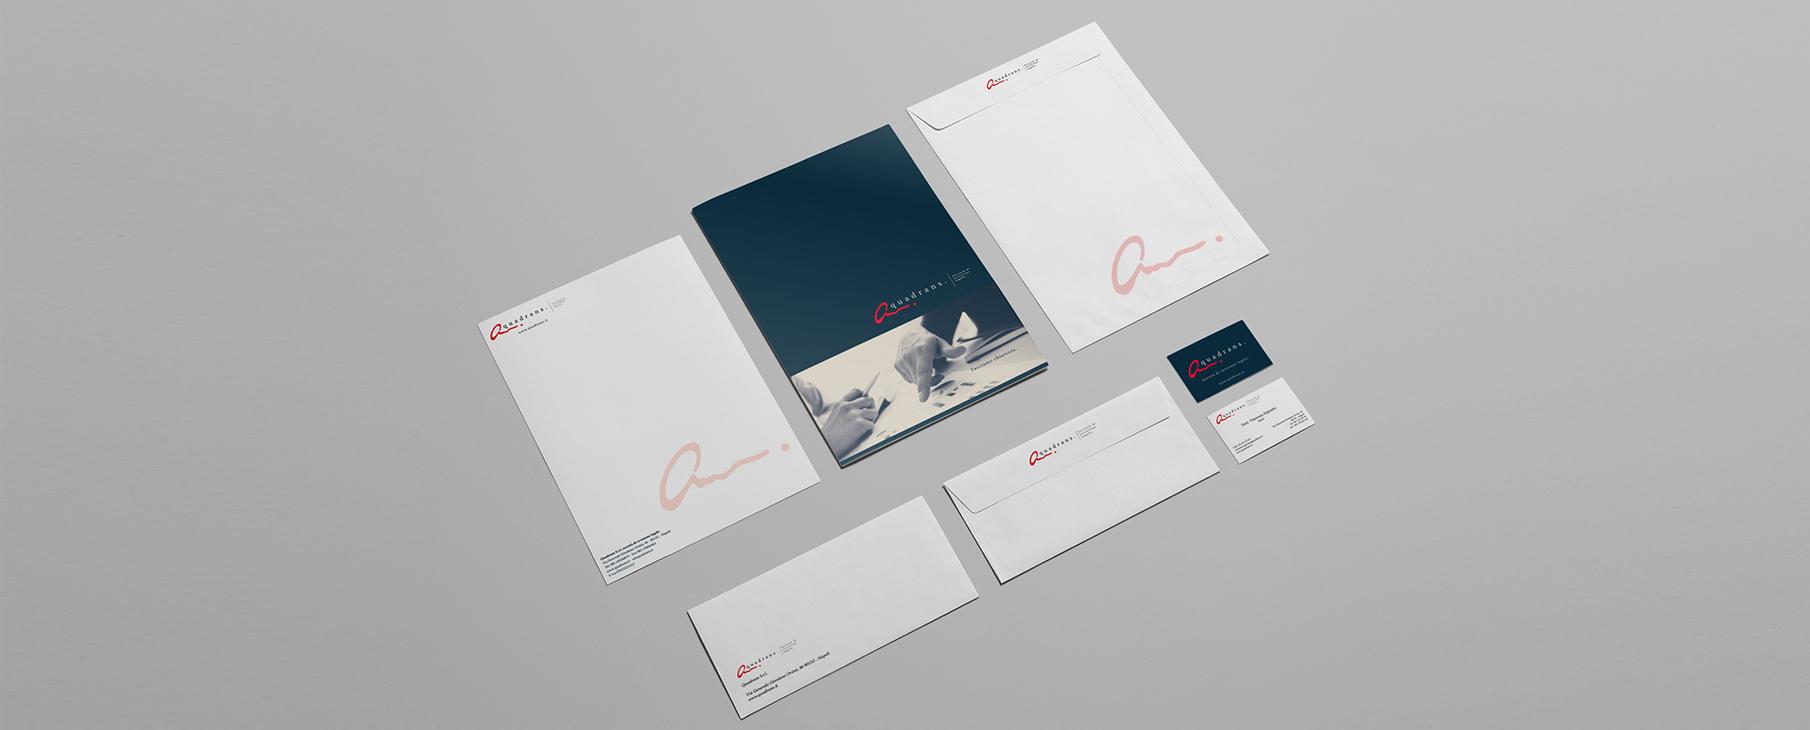 quadrans_project_corporate_identity